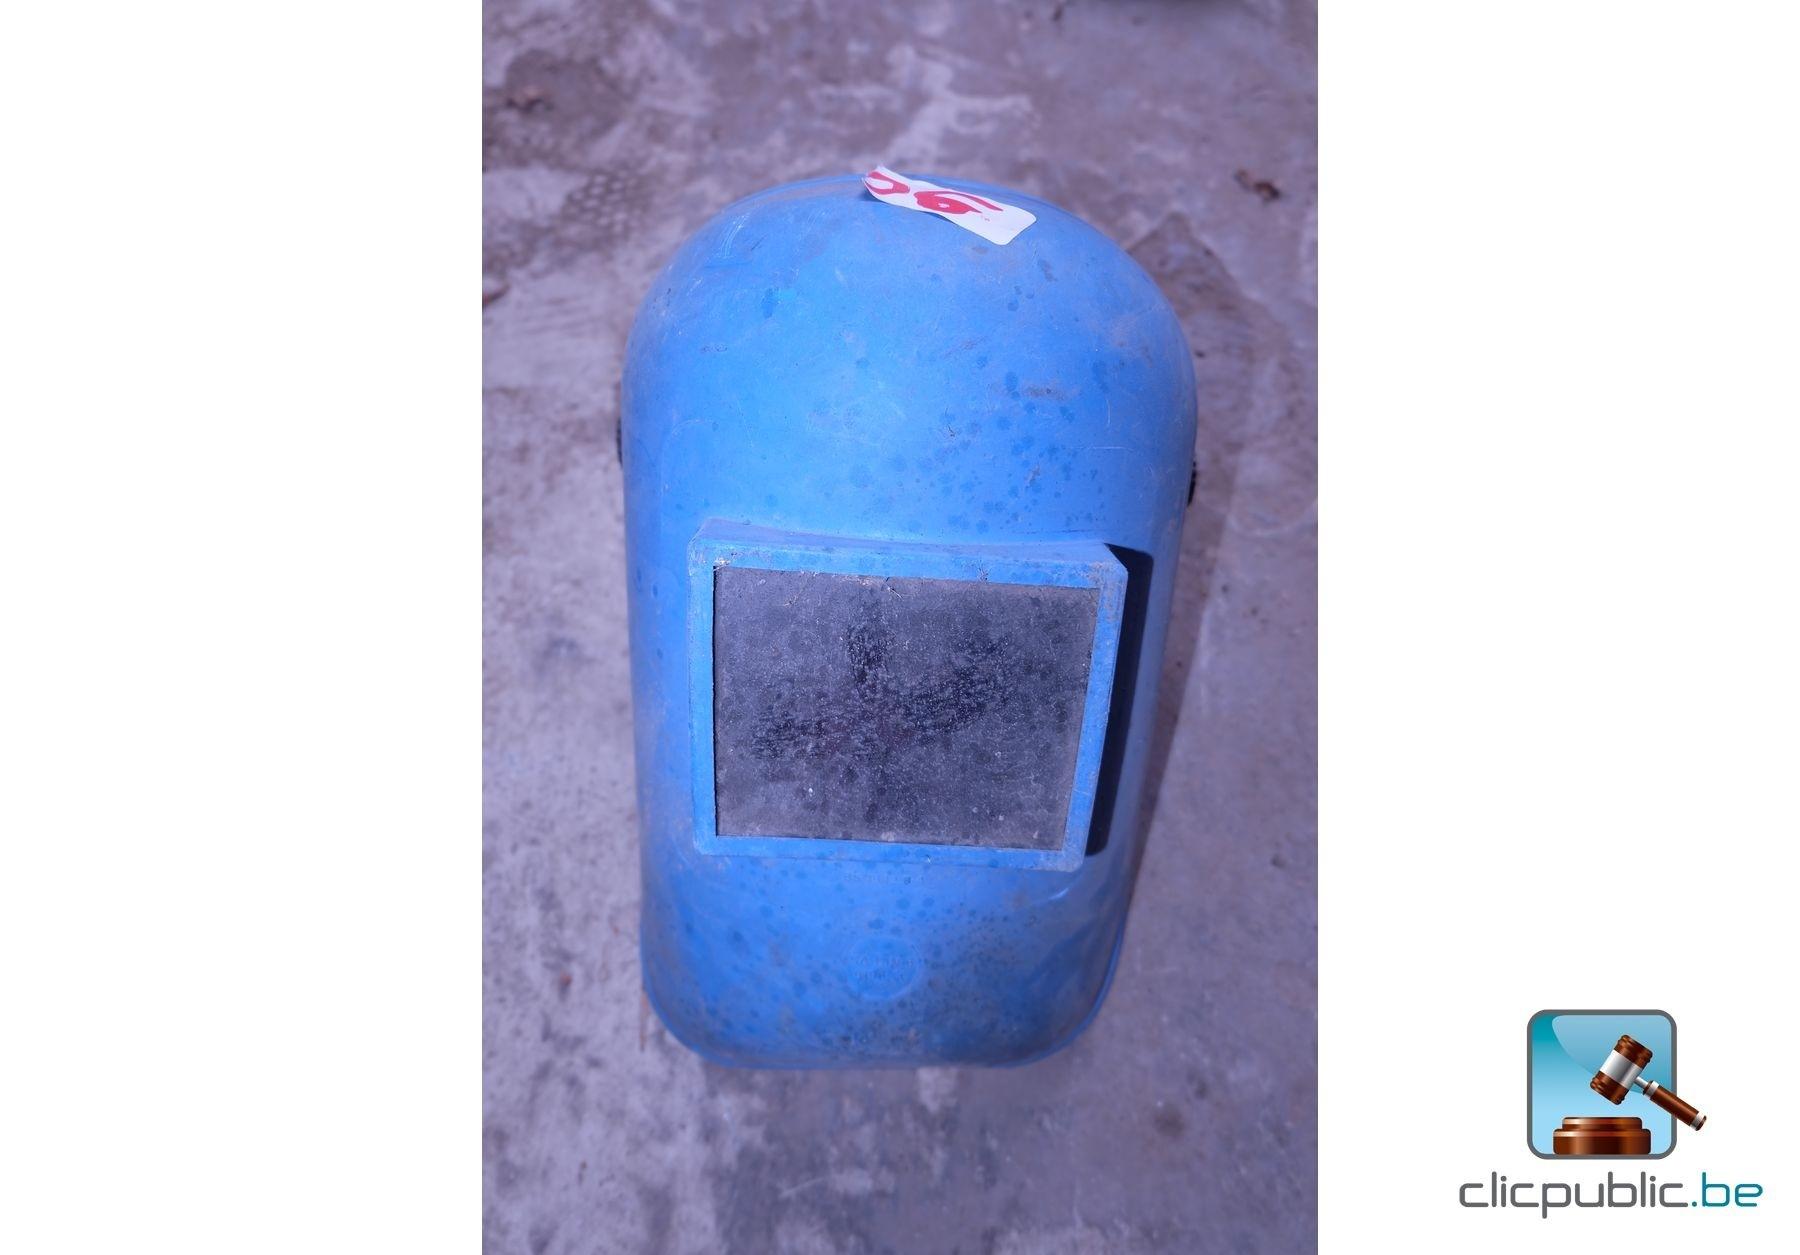 Postes souder nettoyeur haute pression ref 90 for Fonctionnement nettoyeur haute pression